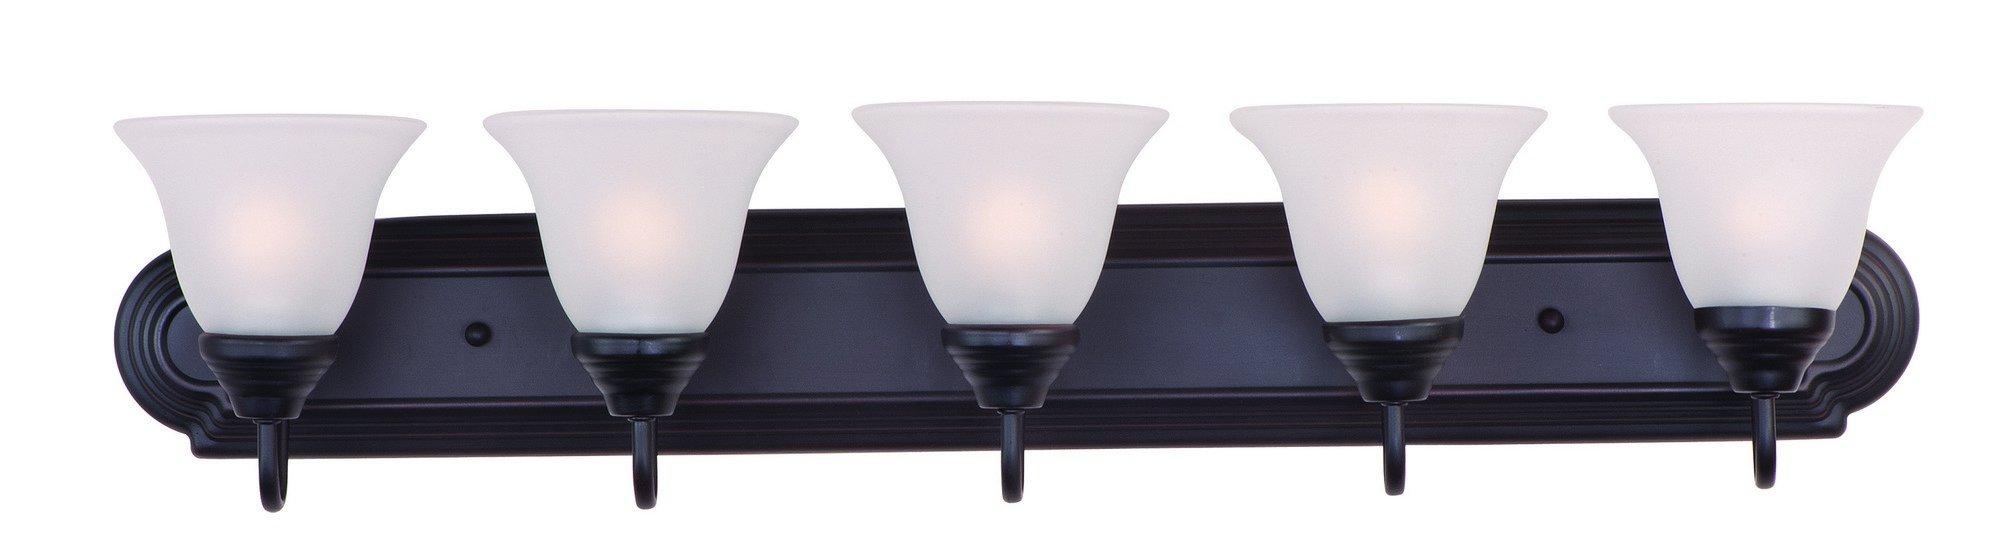 Maxim Lighting 8015 Essentials 801x Bath Vanity Light Fixture, Oil Rubbed Bronze Finish, 36-Inch by 7-Inch